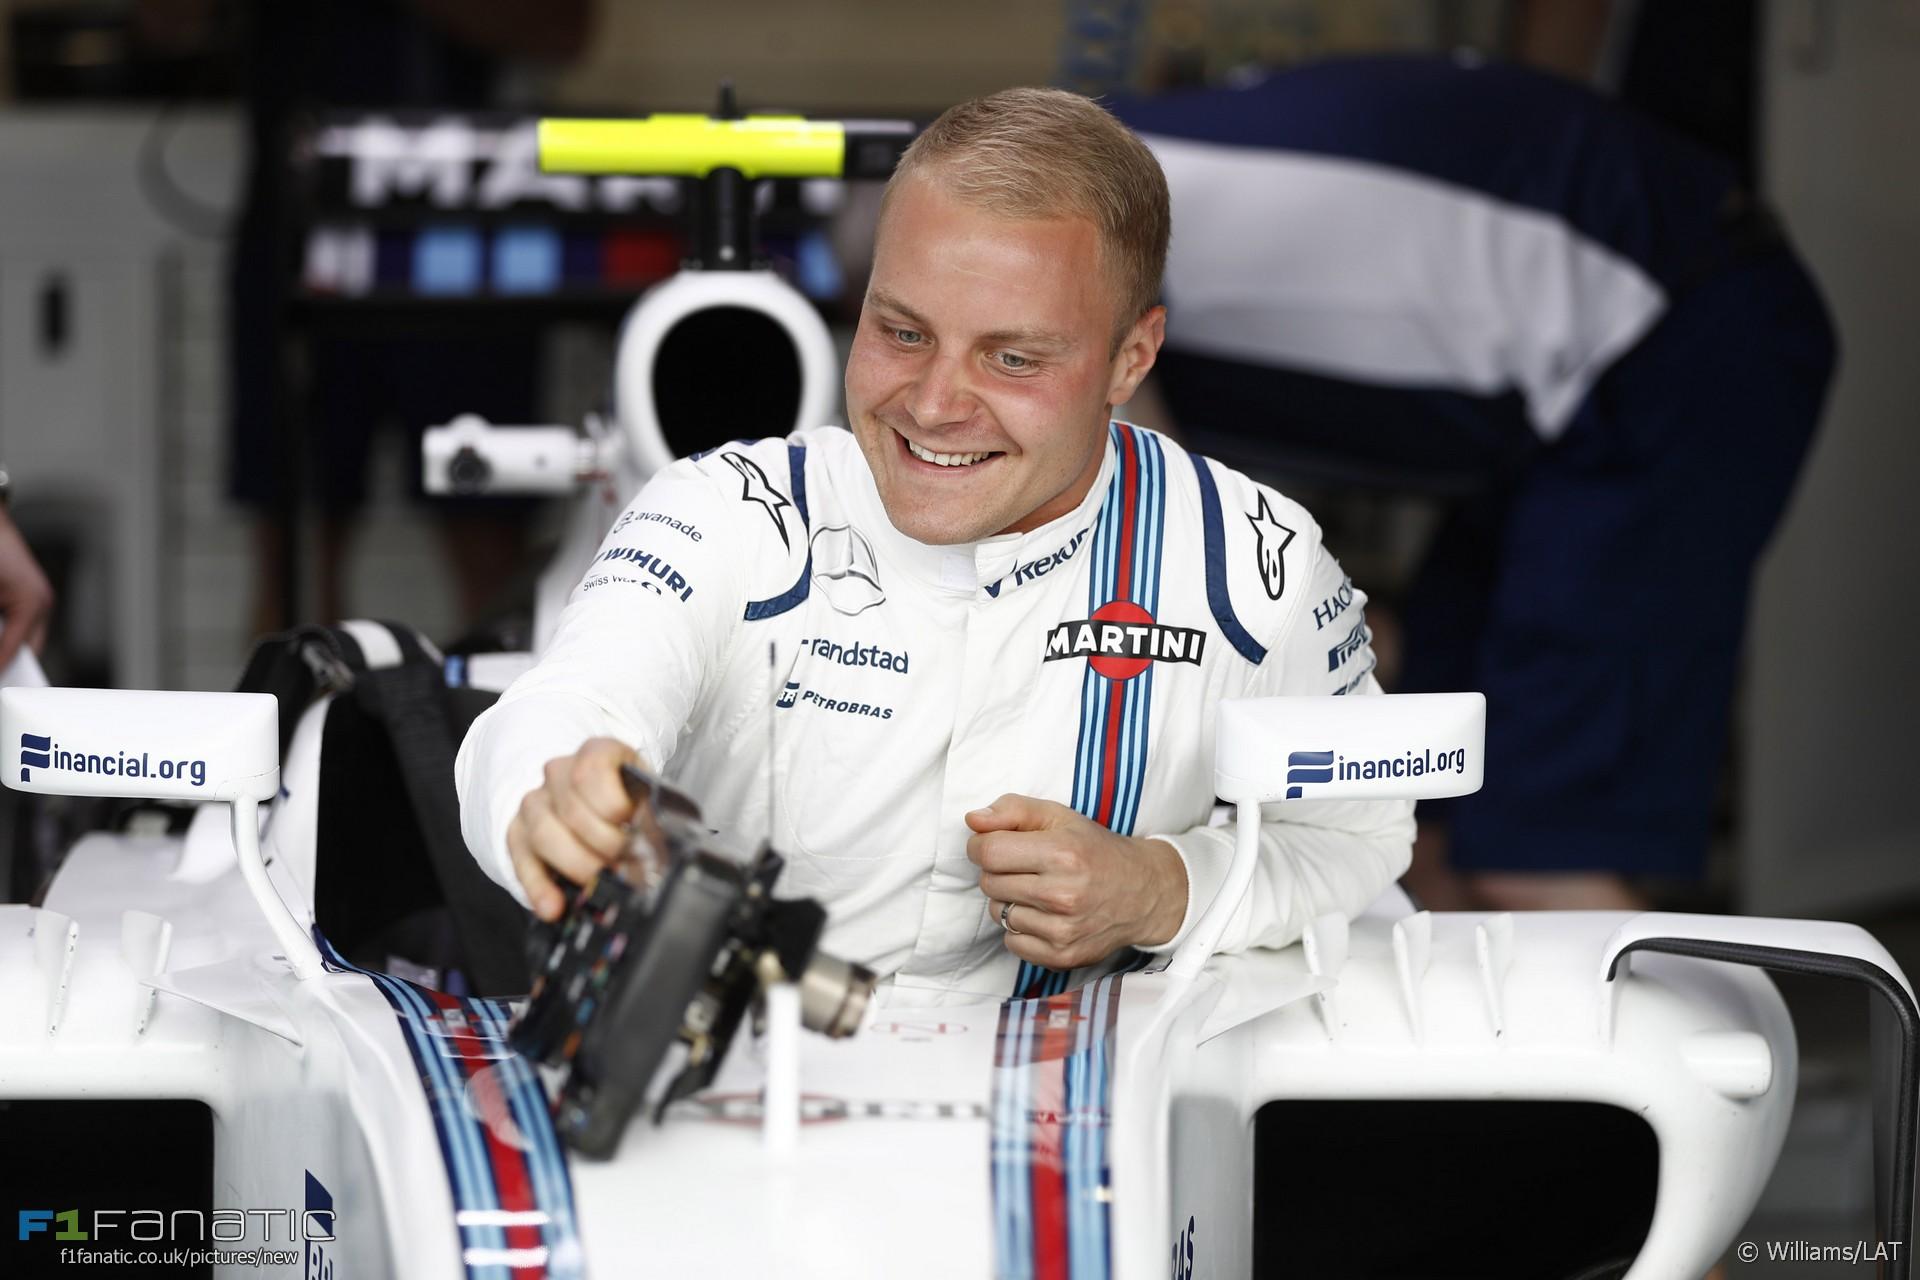 Valtteri Bottas, Williams, Interlagos, 2016